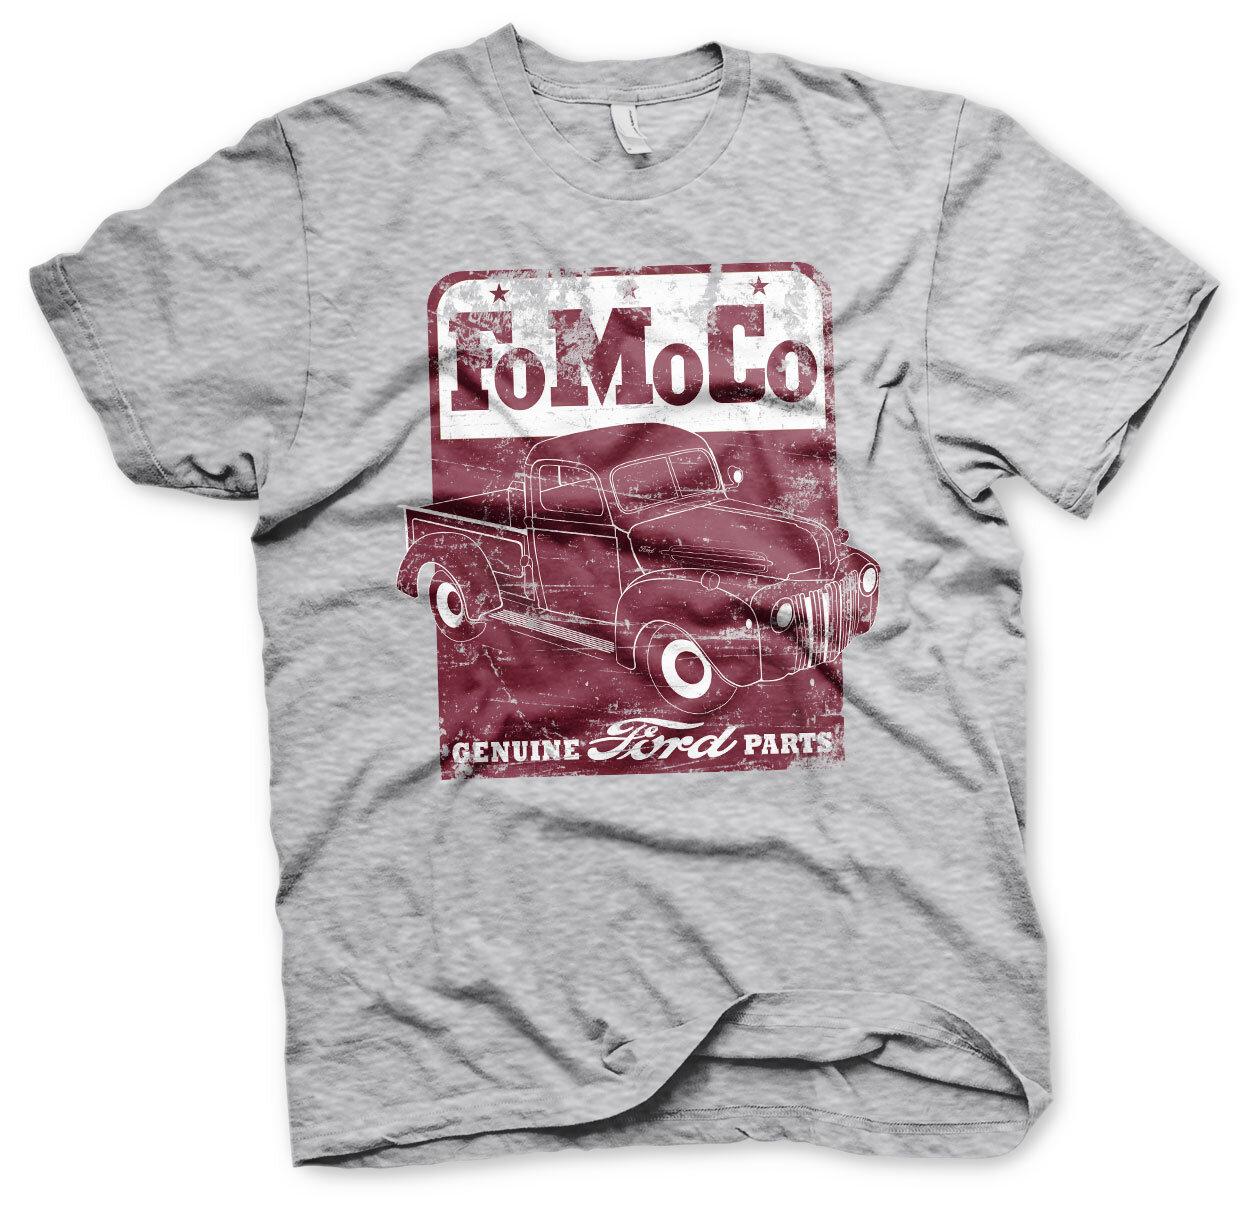 FoMoCo - Genuine Ford Parts T-Shirt